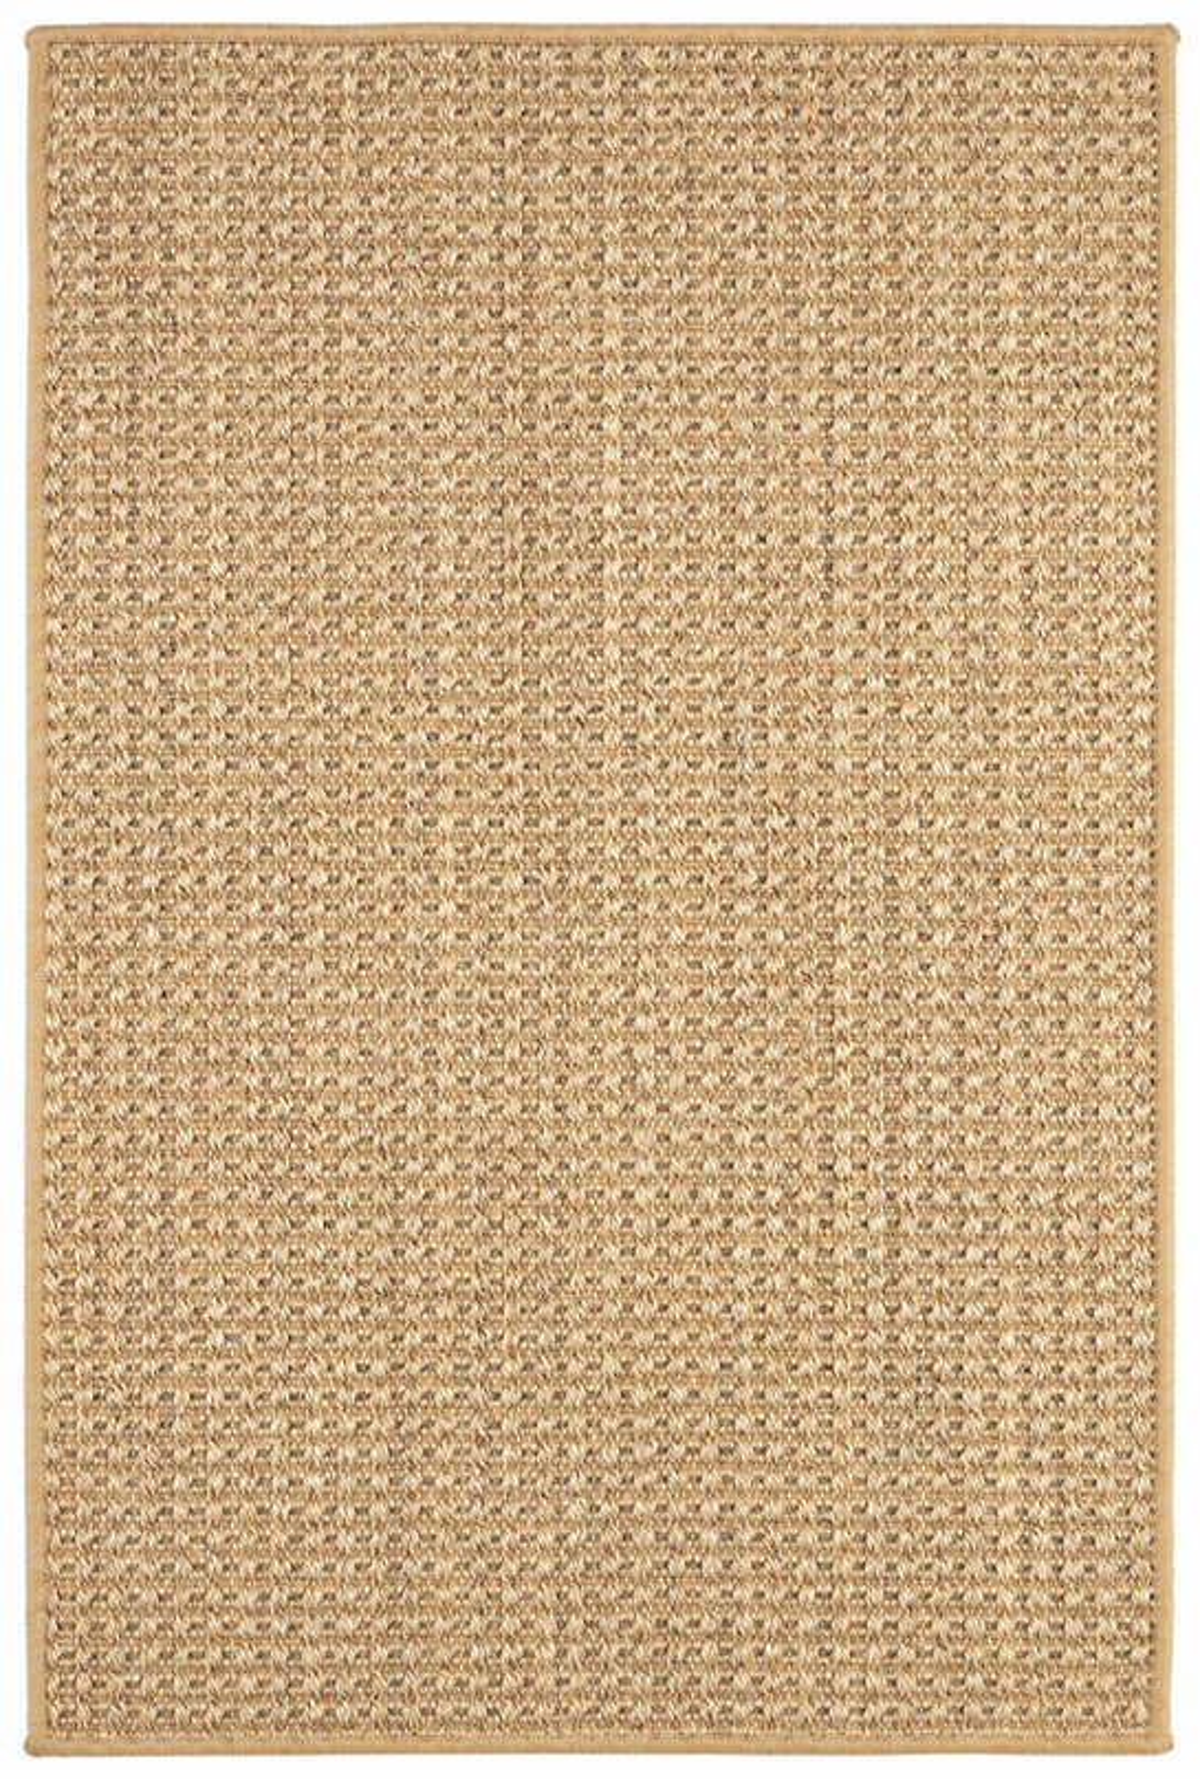 Ashburn Natural Woven Sisal Custom Rug